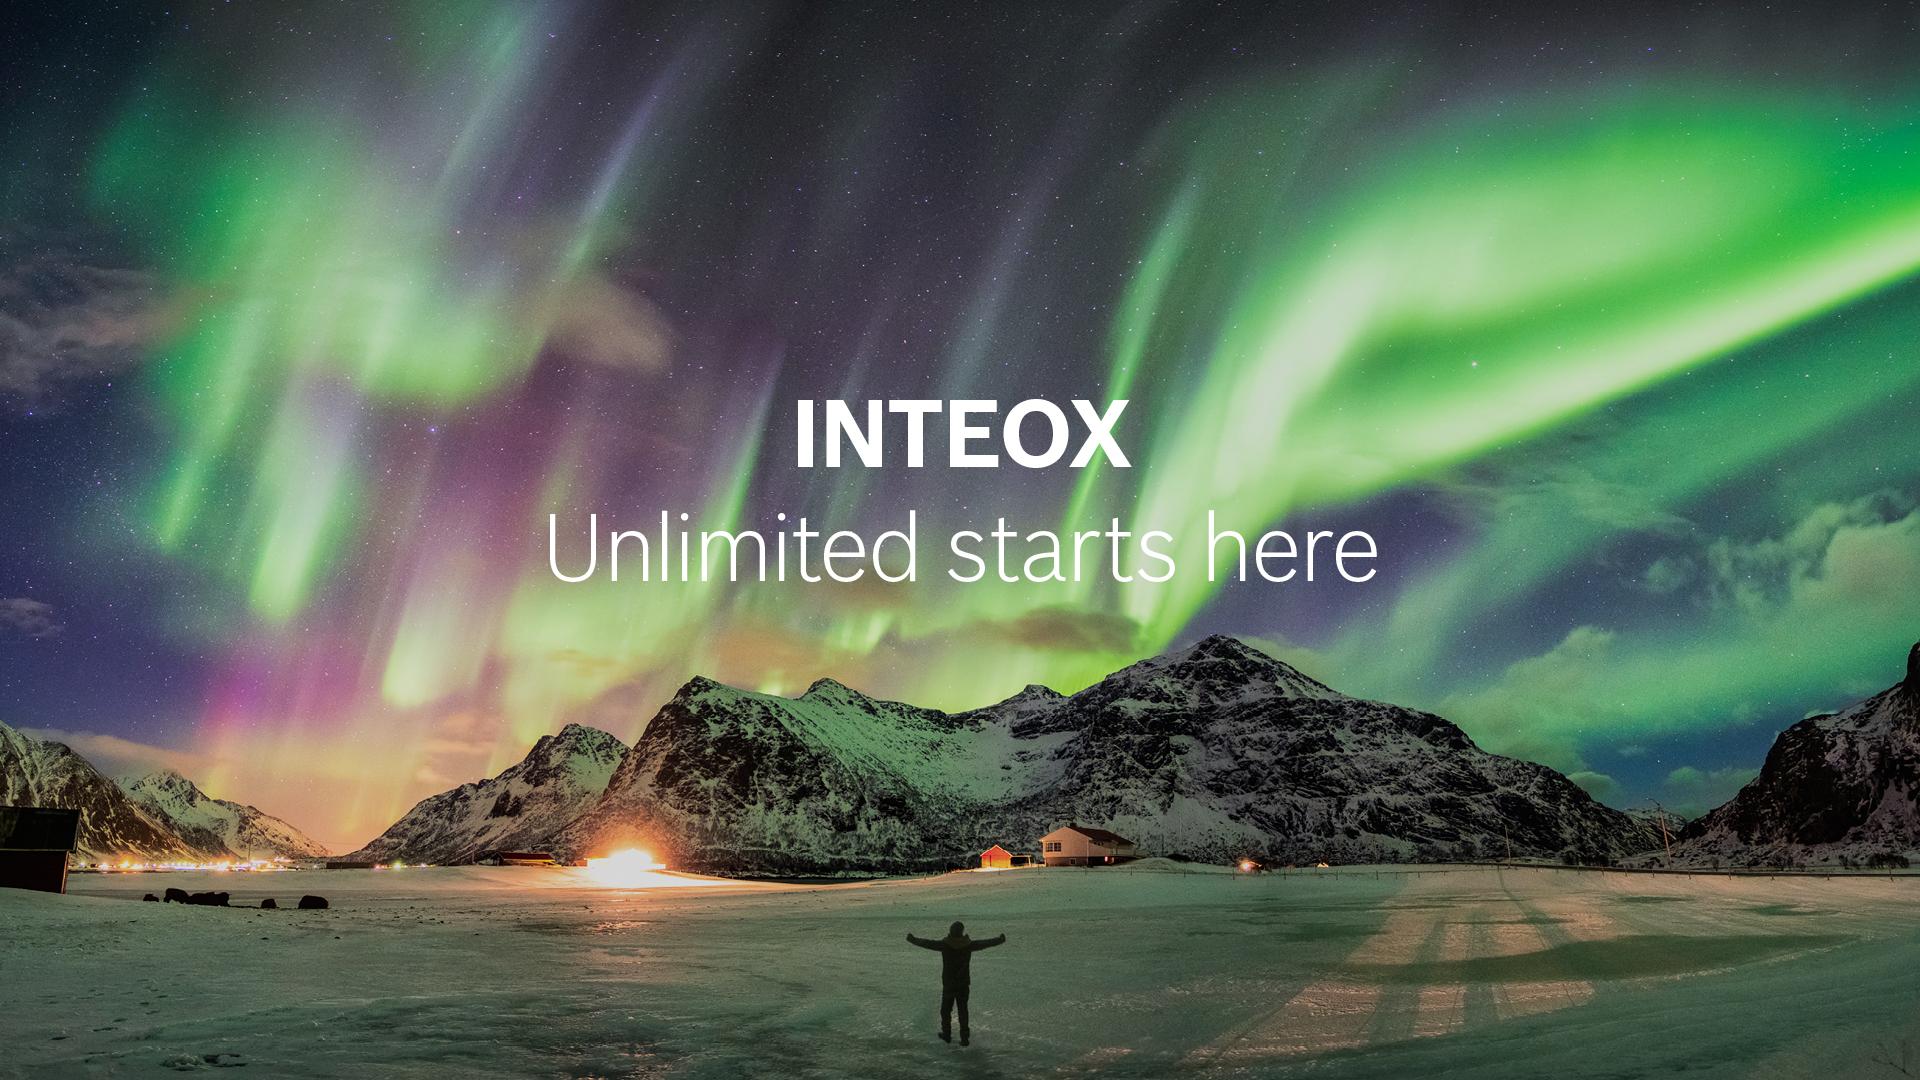 INTEOX_key_visual